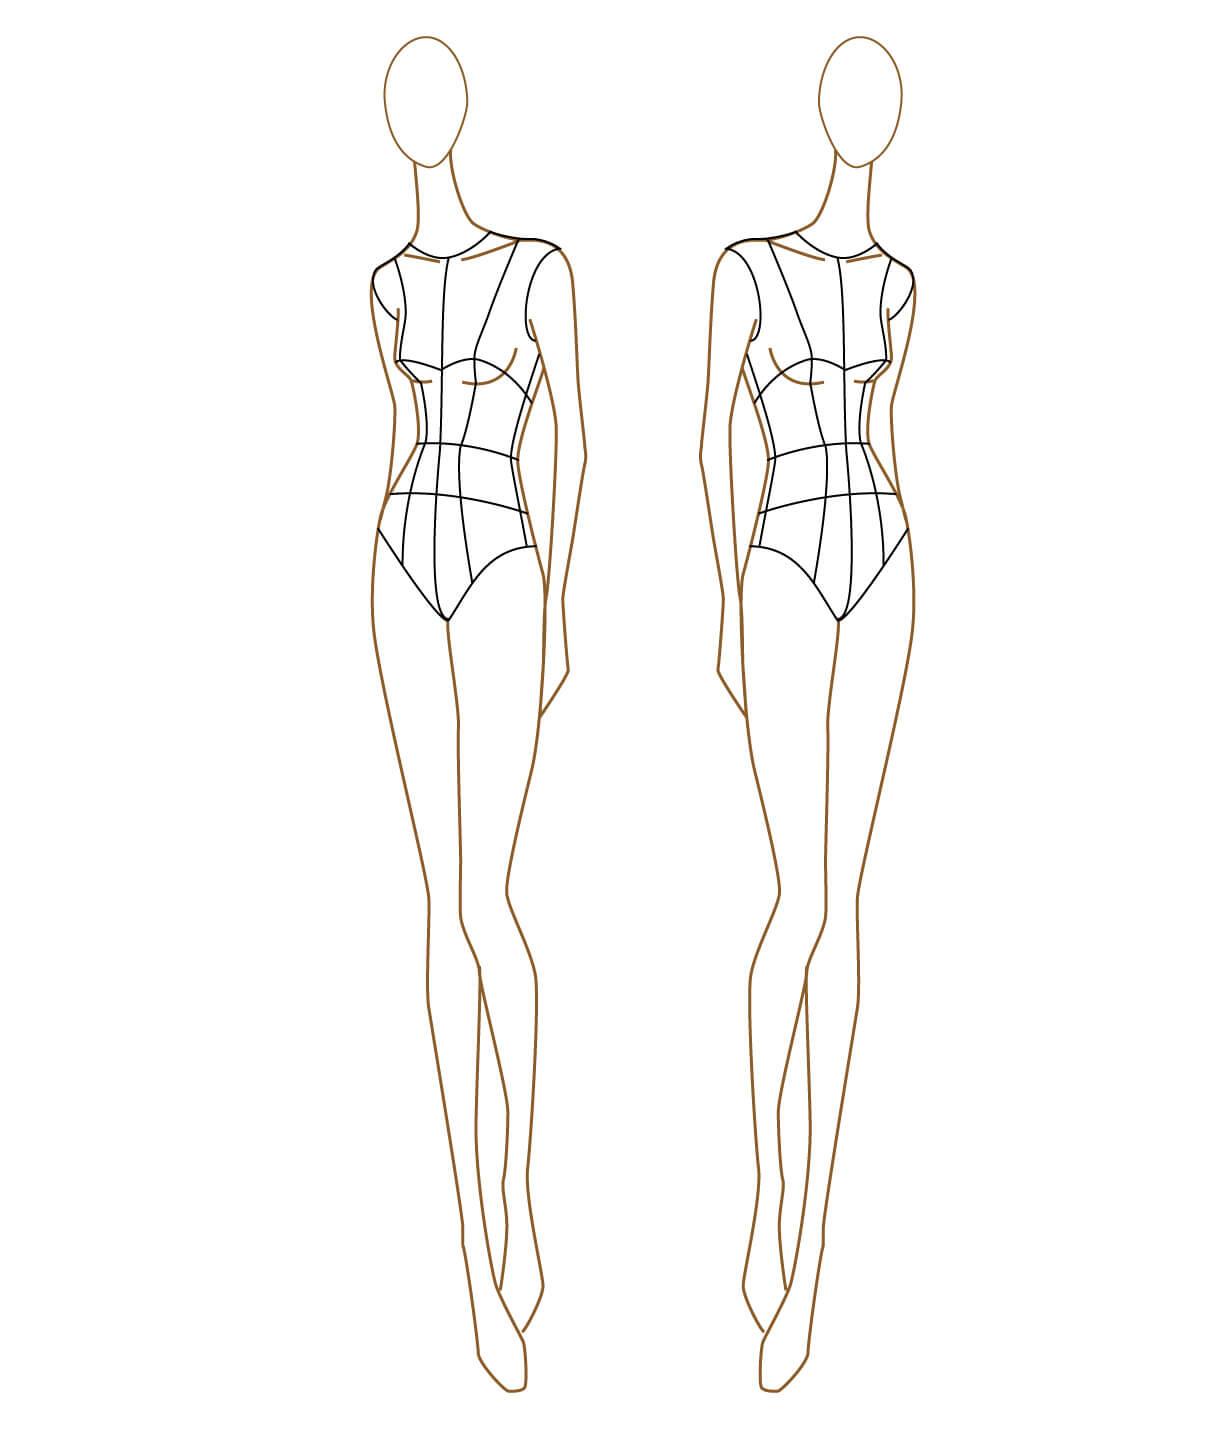 Clothing Model Sketch At Paintingvalley   Explore Regarding Blank Model Sketch Template